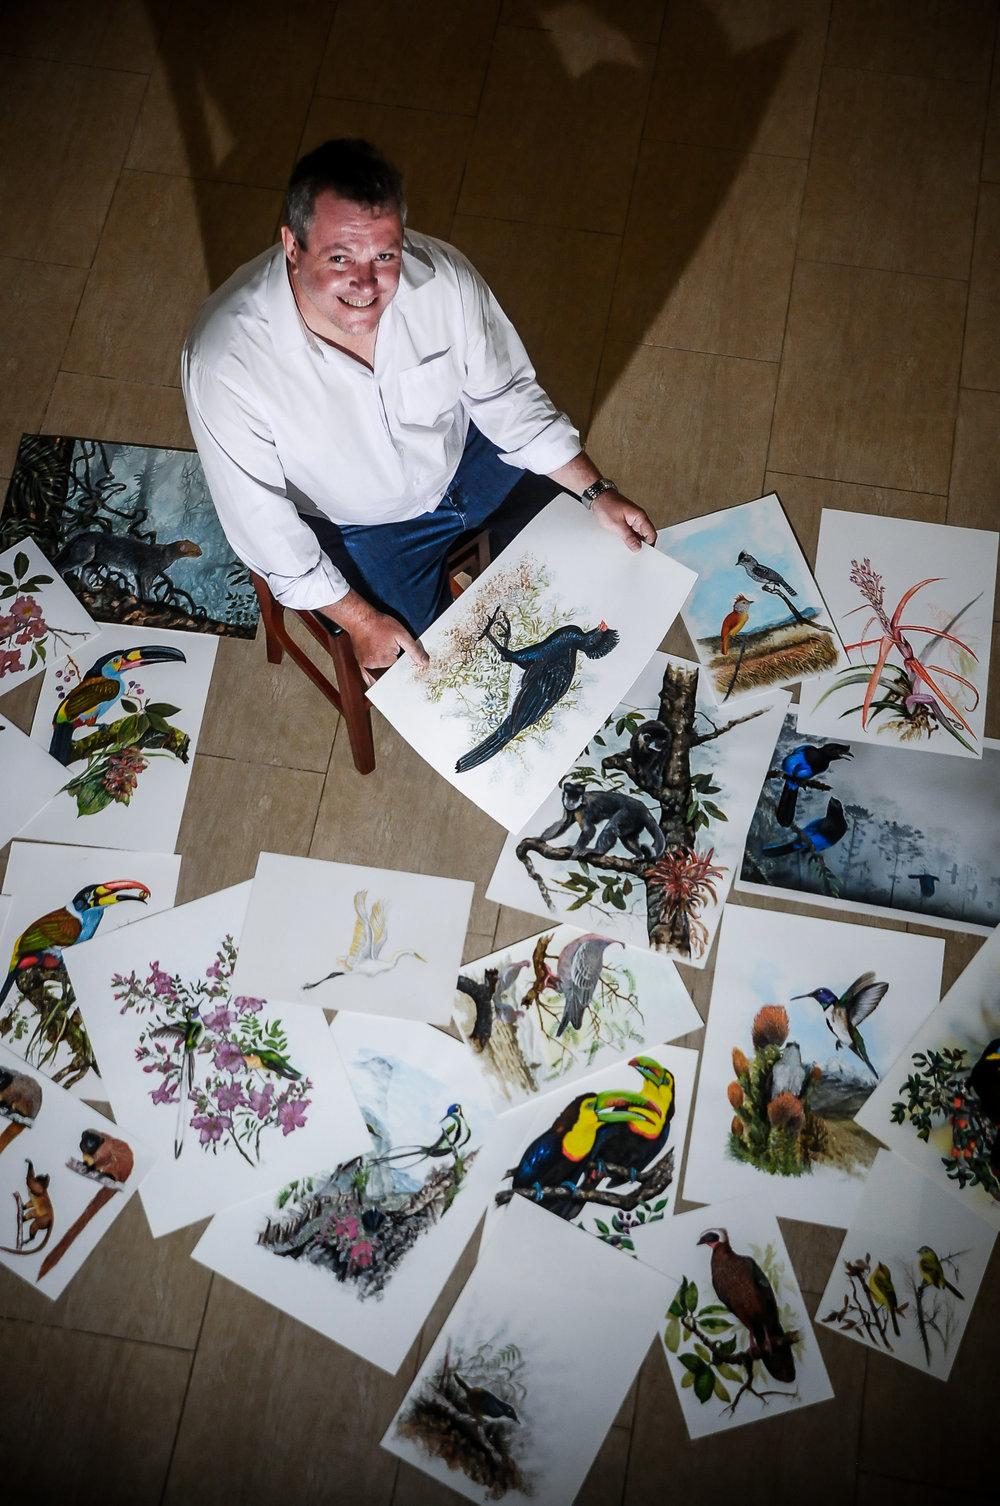 Artist Tomas Sigrist